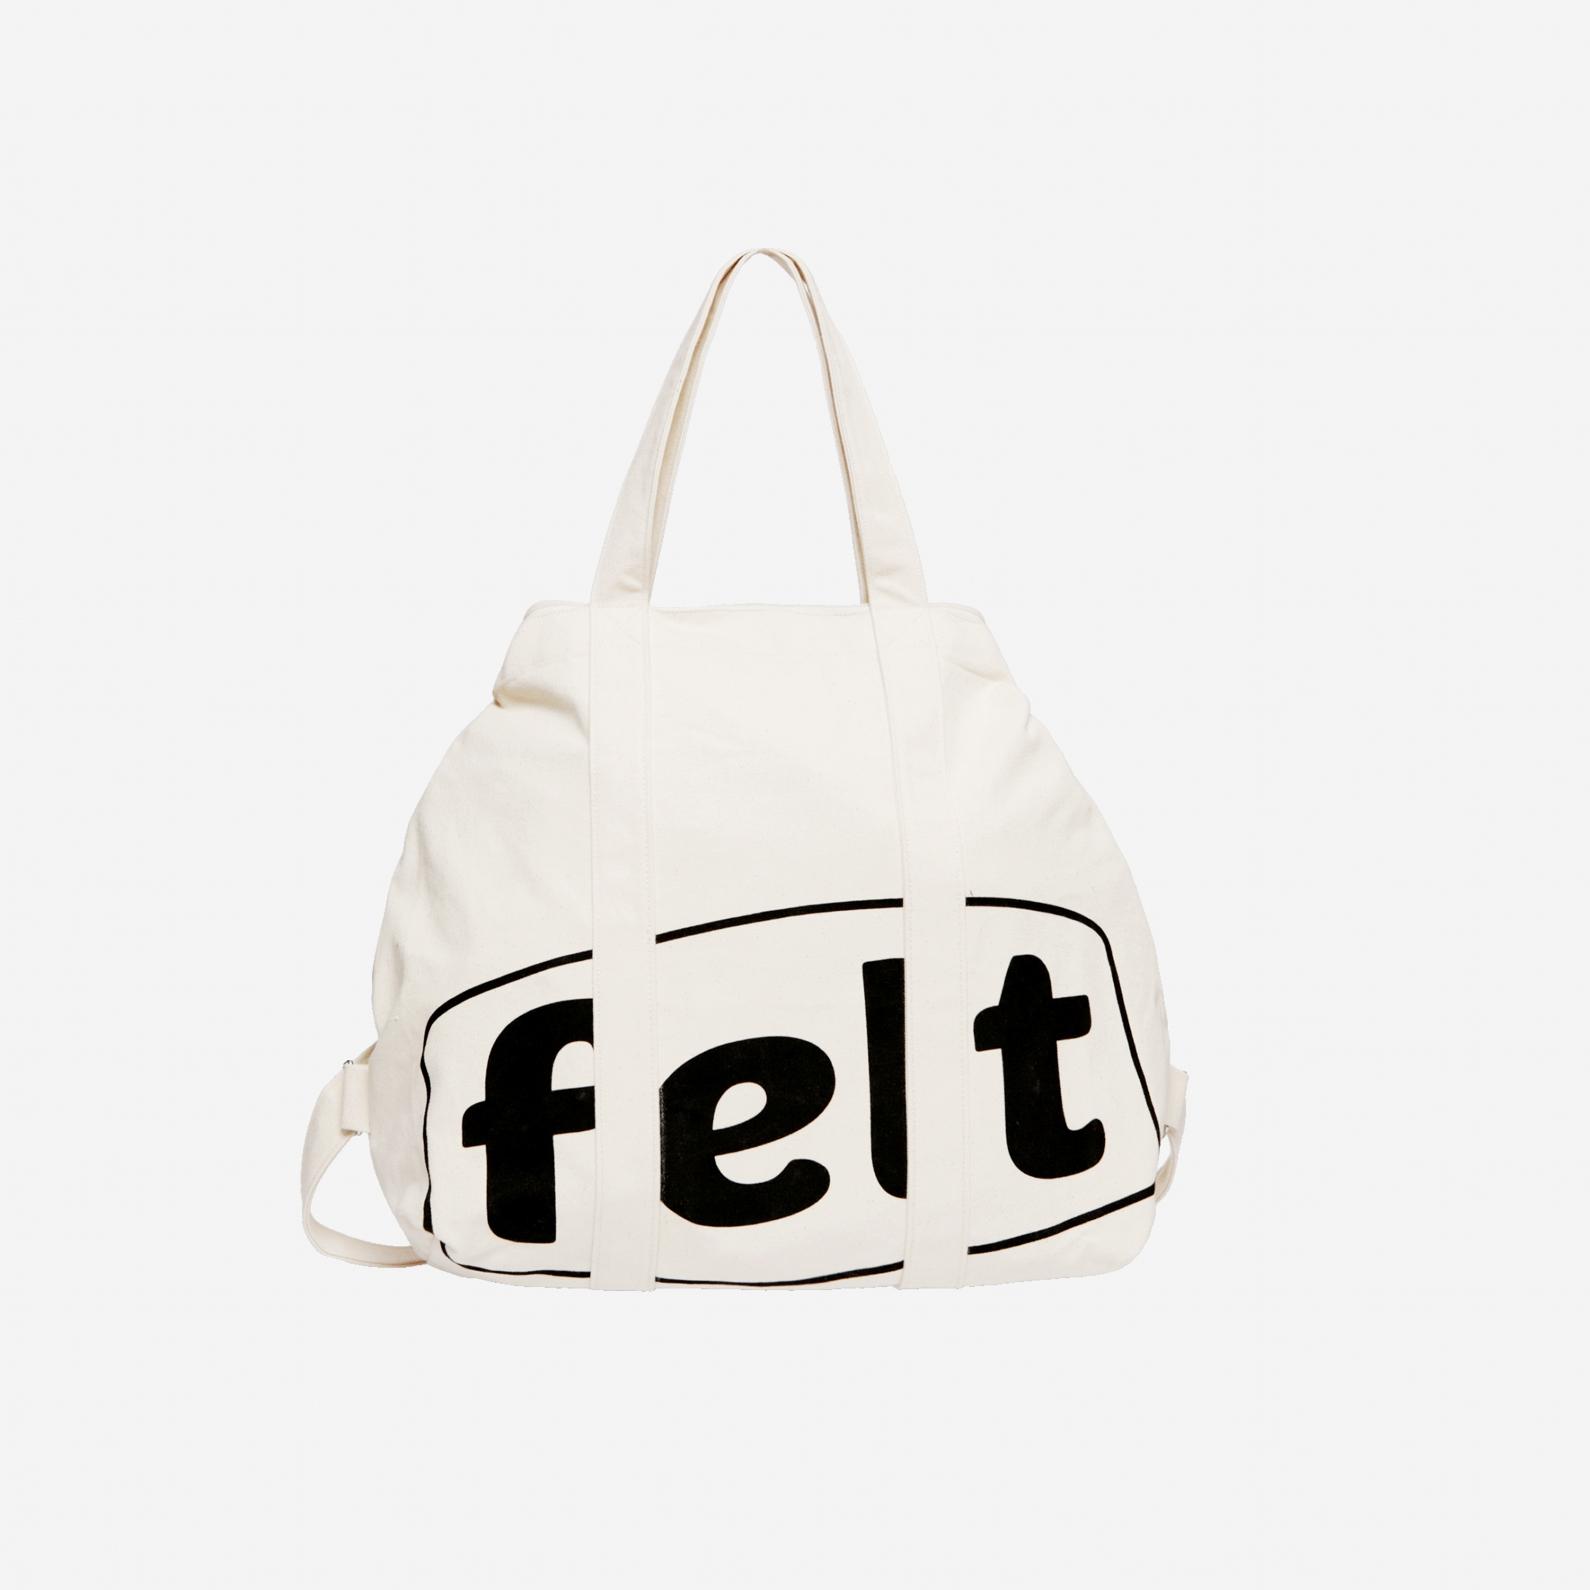 【FELT/フェルト】NAKAMEGURO CANVAS TOTE BAG トートバッグ / NATURAL